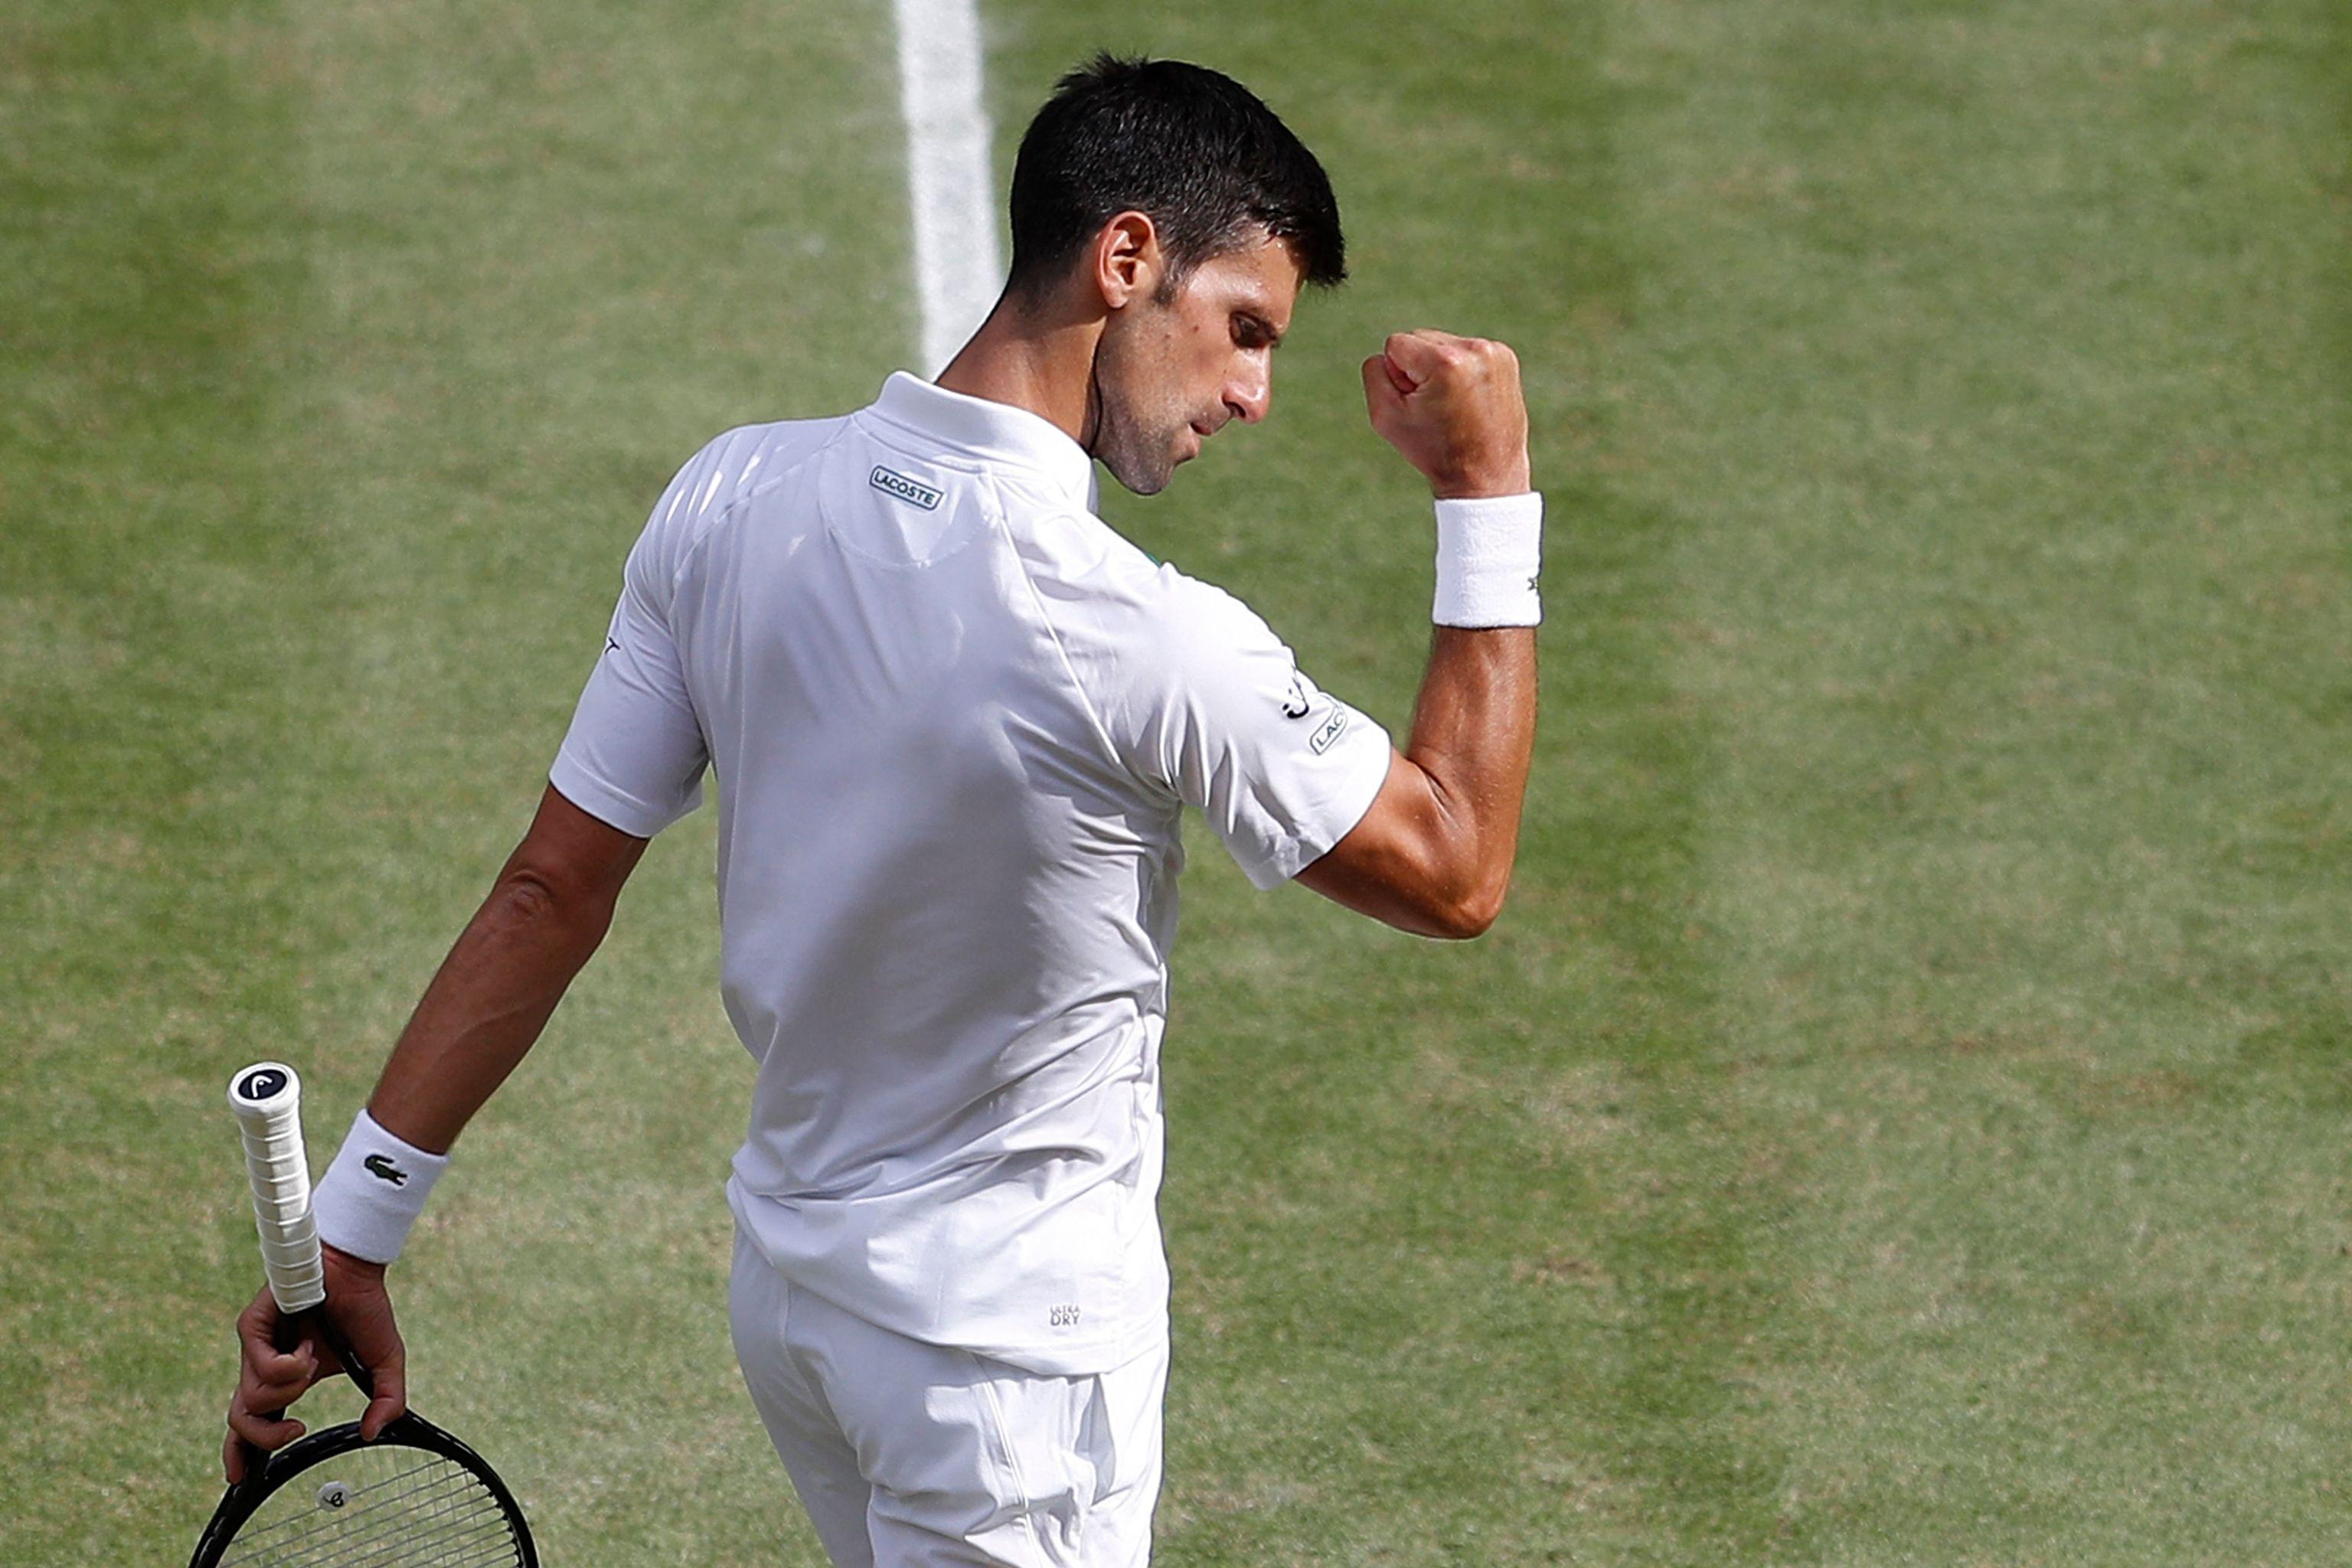 Djokovic celebra un punto ante Berrettini en la final de Wimbledon.